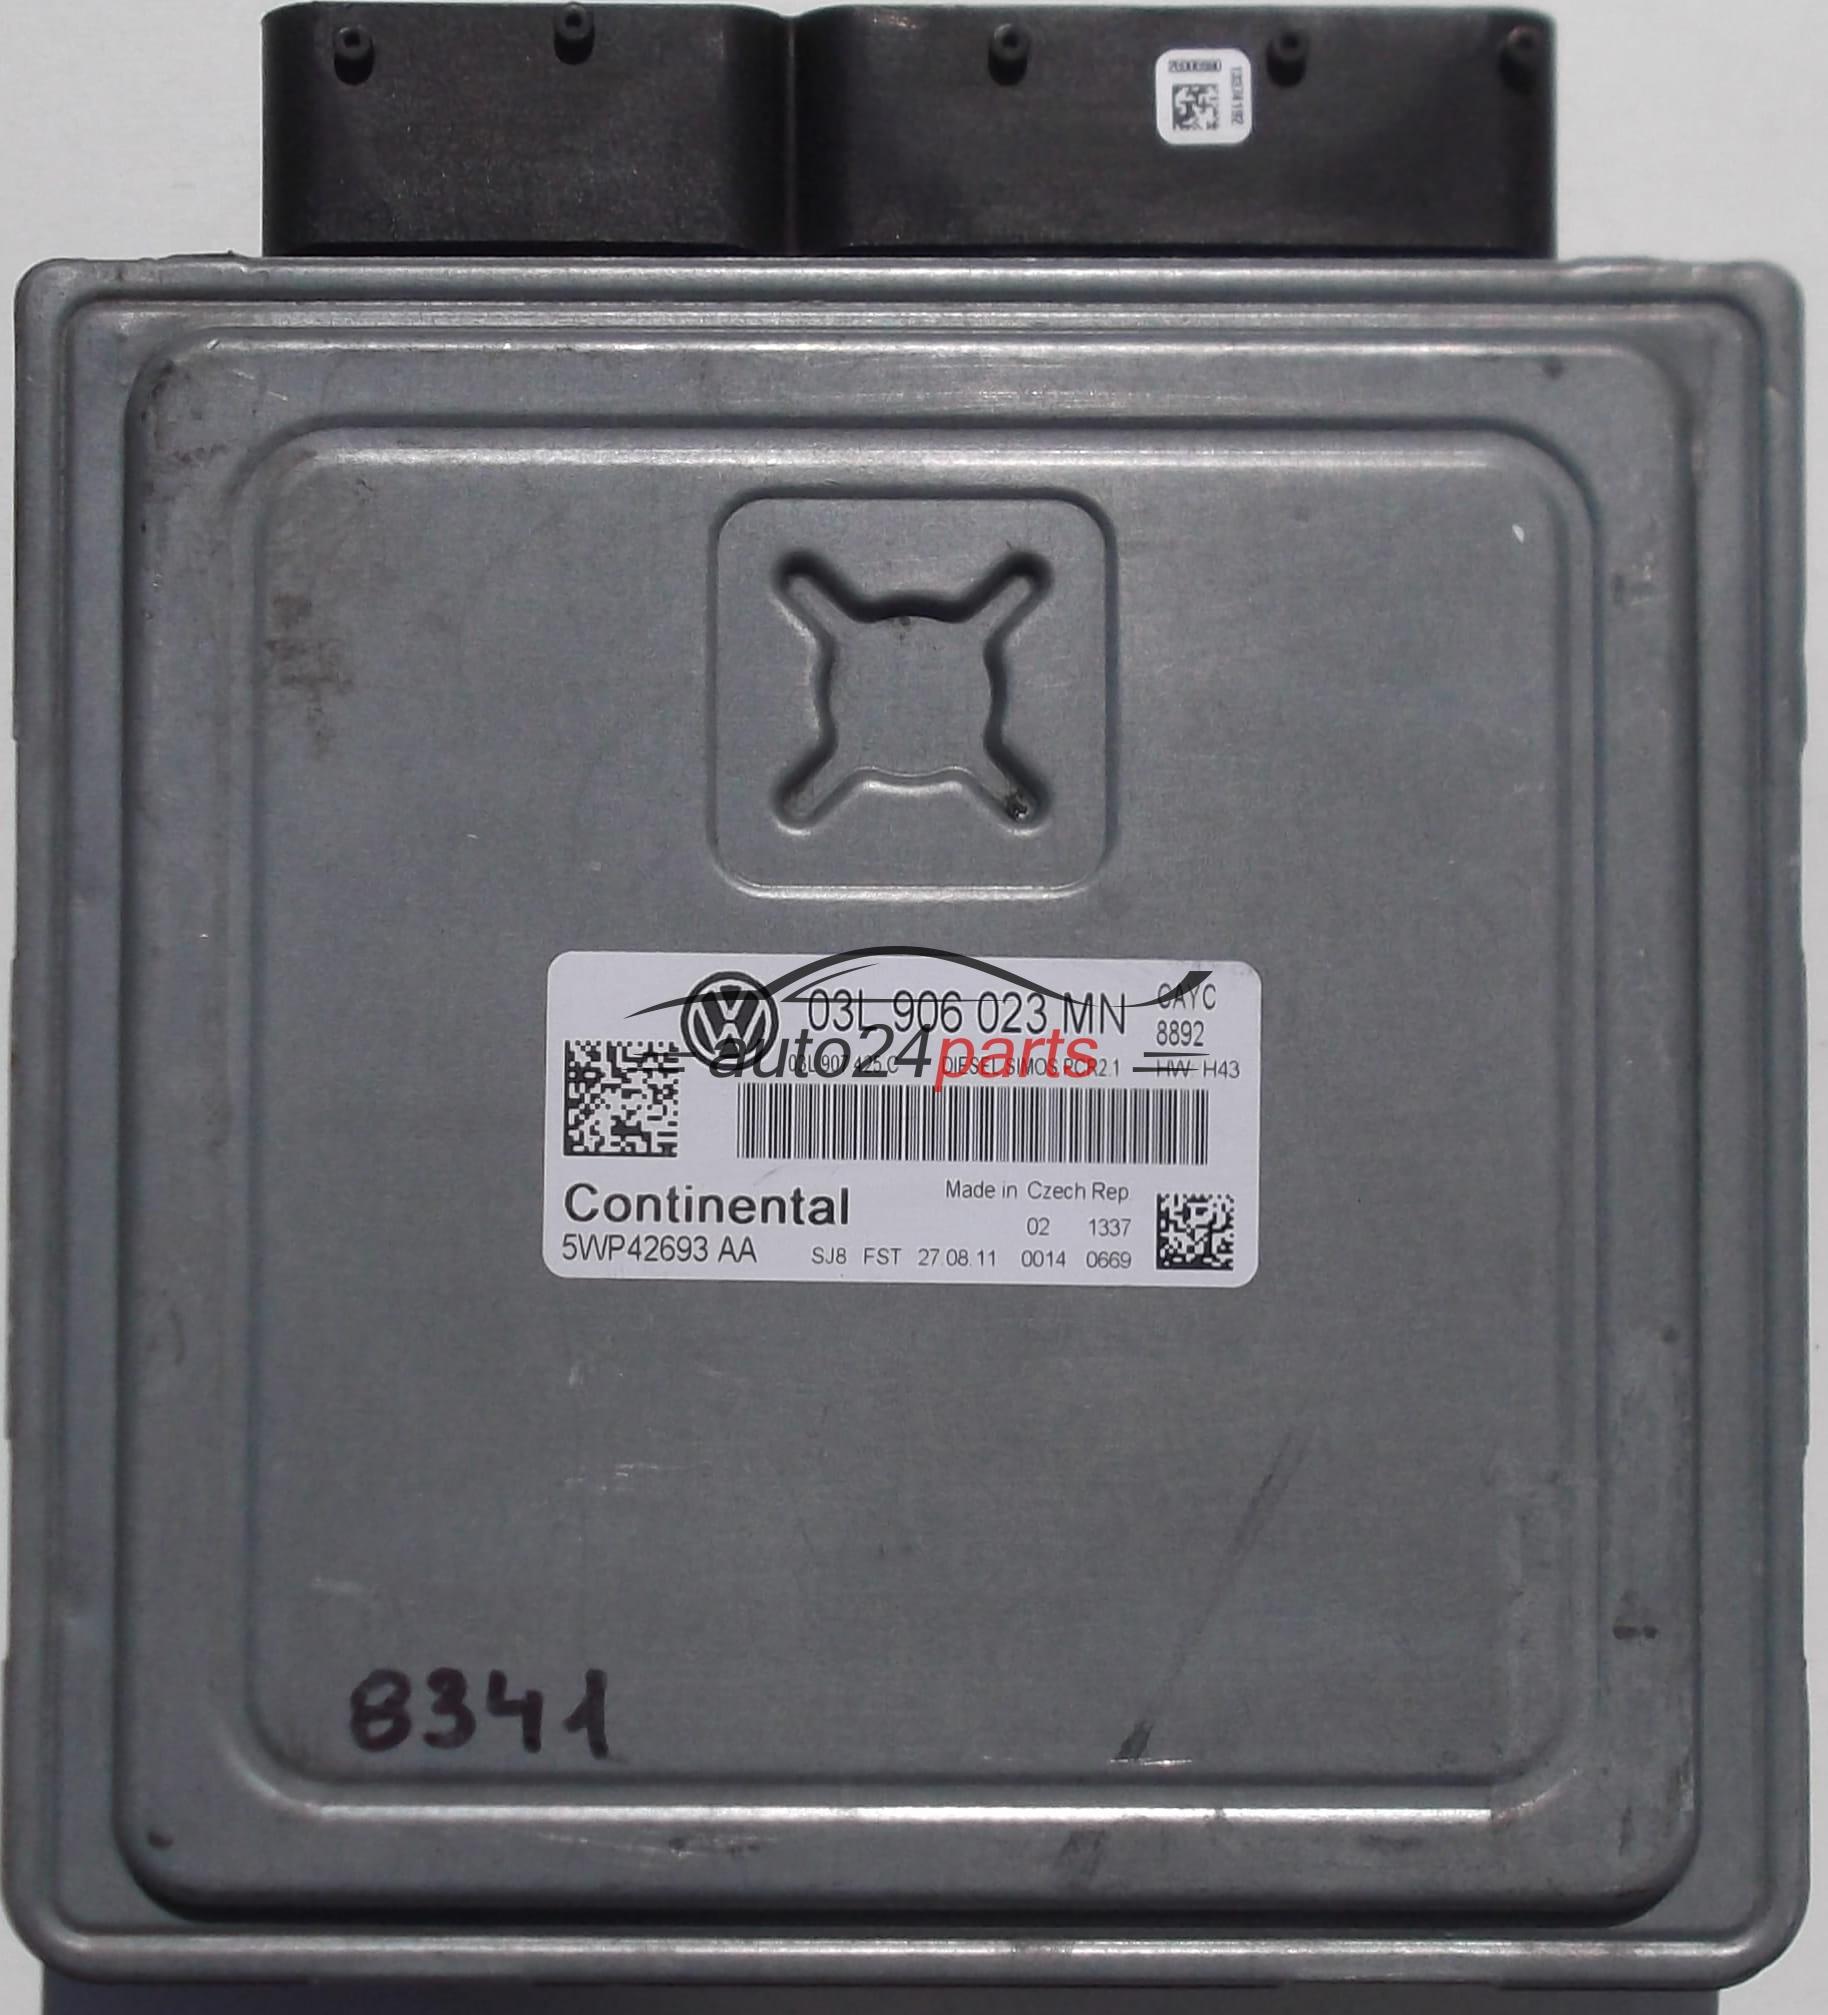 ECU ENGINE CONTROLLER VW VOLKSWAGEN GOLF MK6 1 6 TDI, 5WP42693AA,  03L906023MN, SIMOS PRC2 1